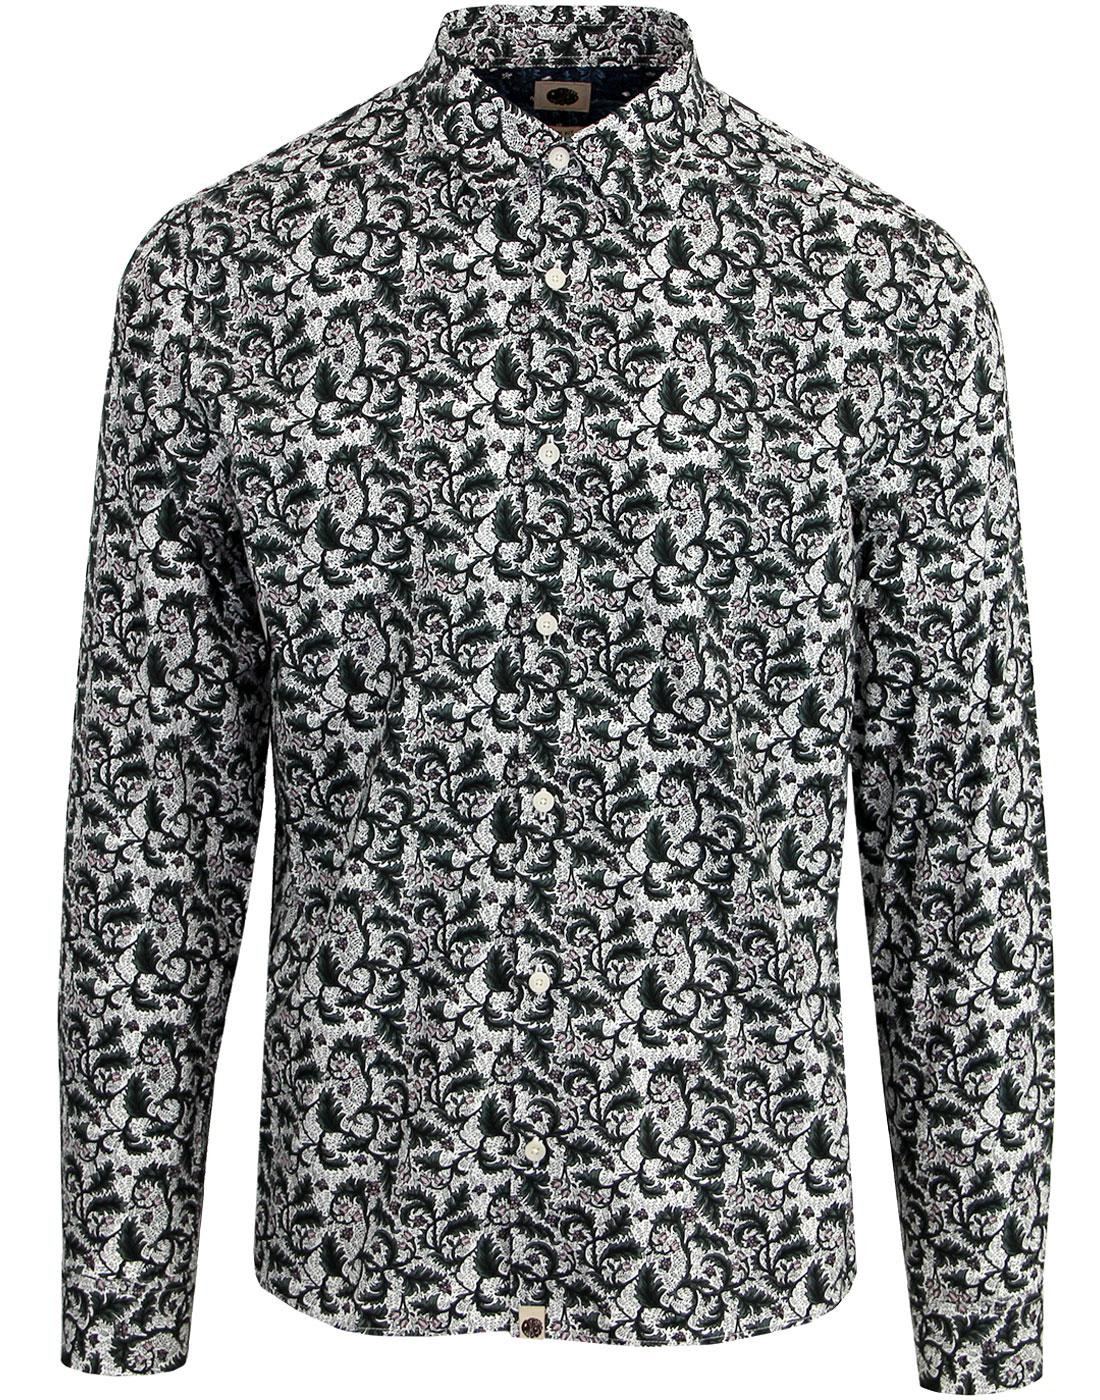 PRETTY GREEN Retro 60's Floral Print Shirt - Green